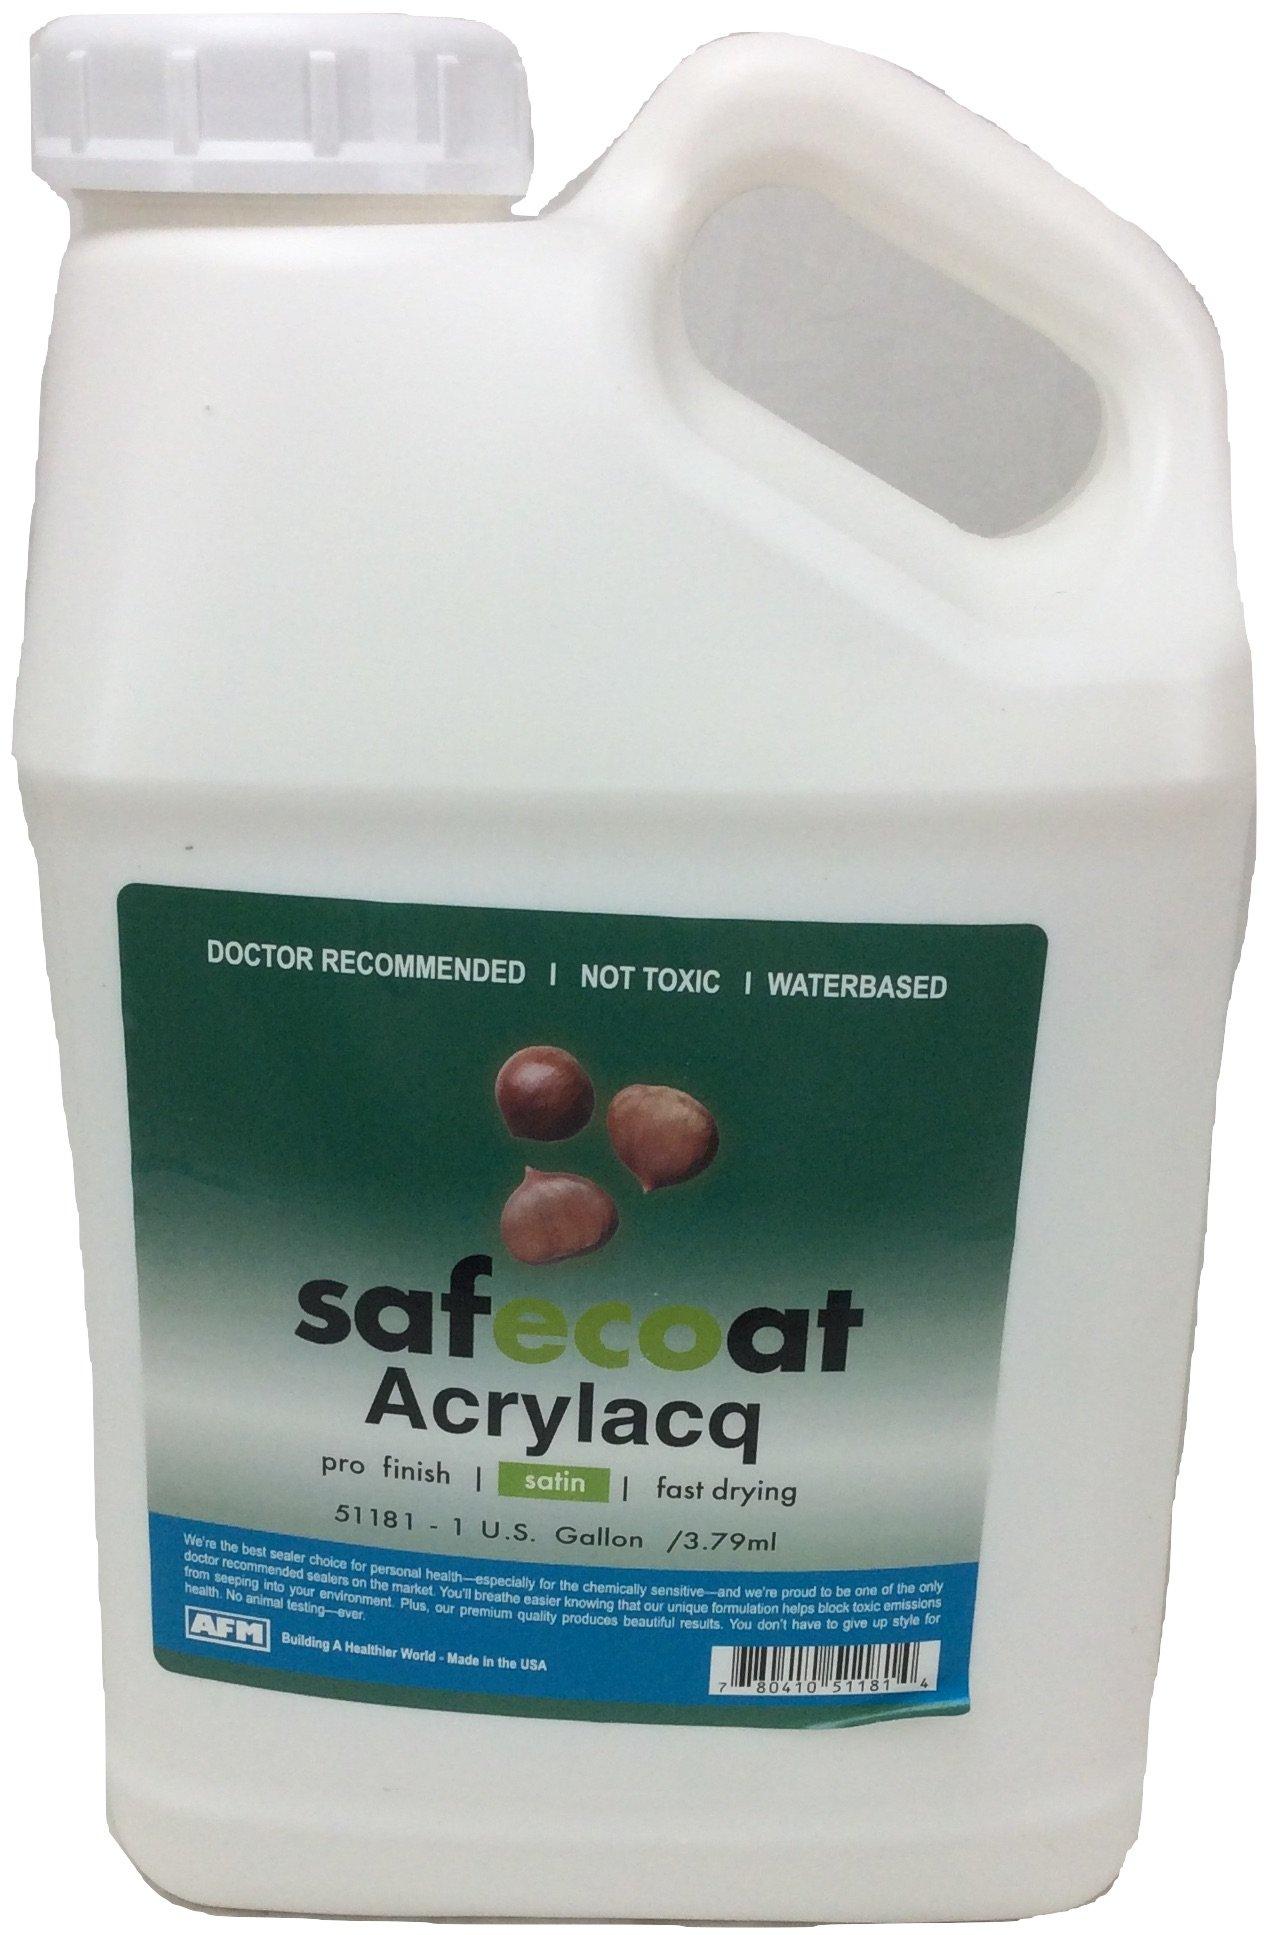 AFM Safecoat Acrylacq Waterbased Satin Lacquer Finish - Gallon